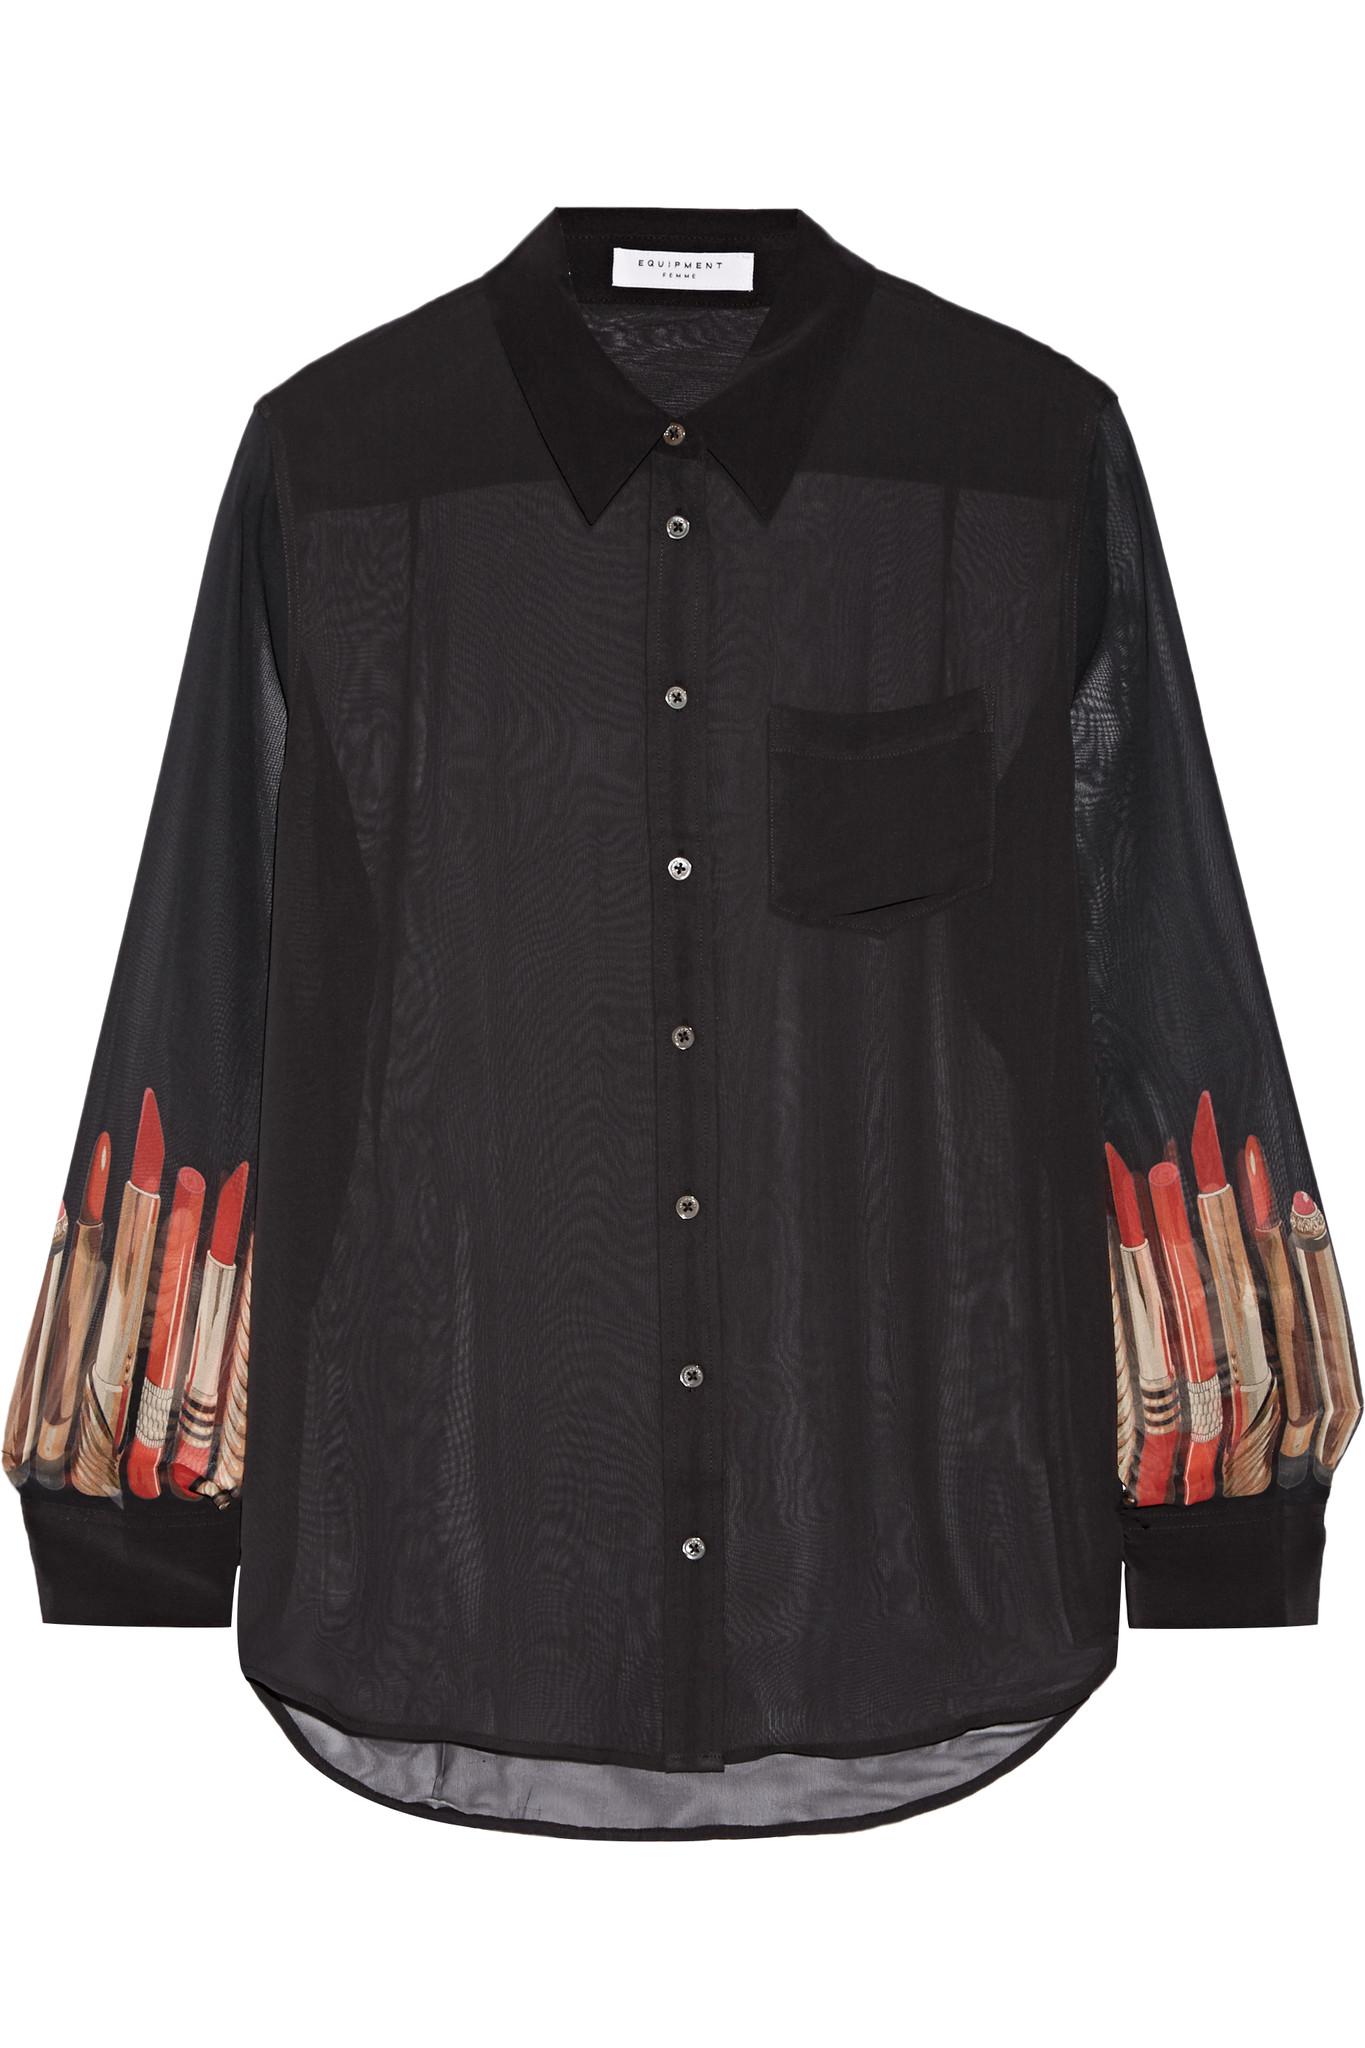 Equipment reese printed silk chiffon shirt in black lyst for Equipment black silk shirt